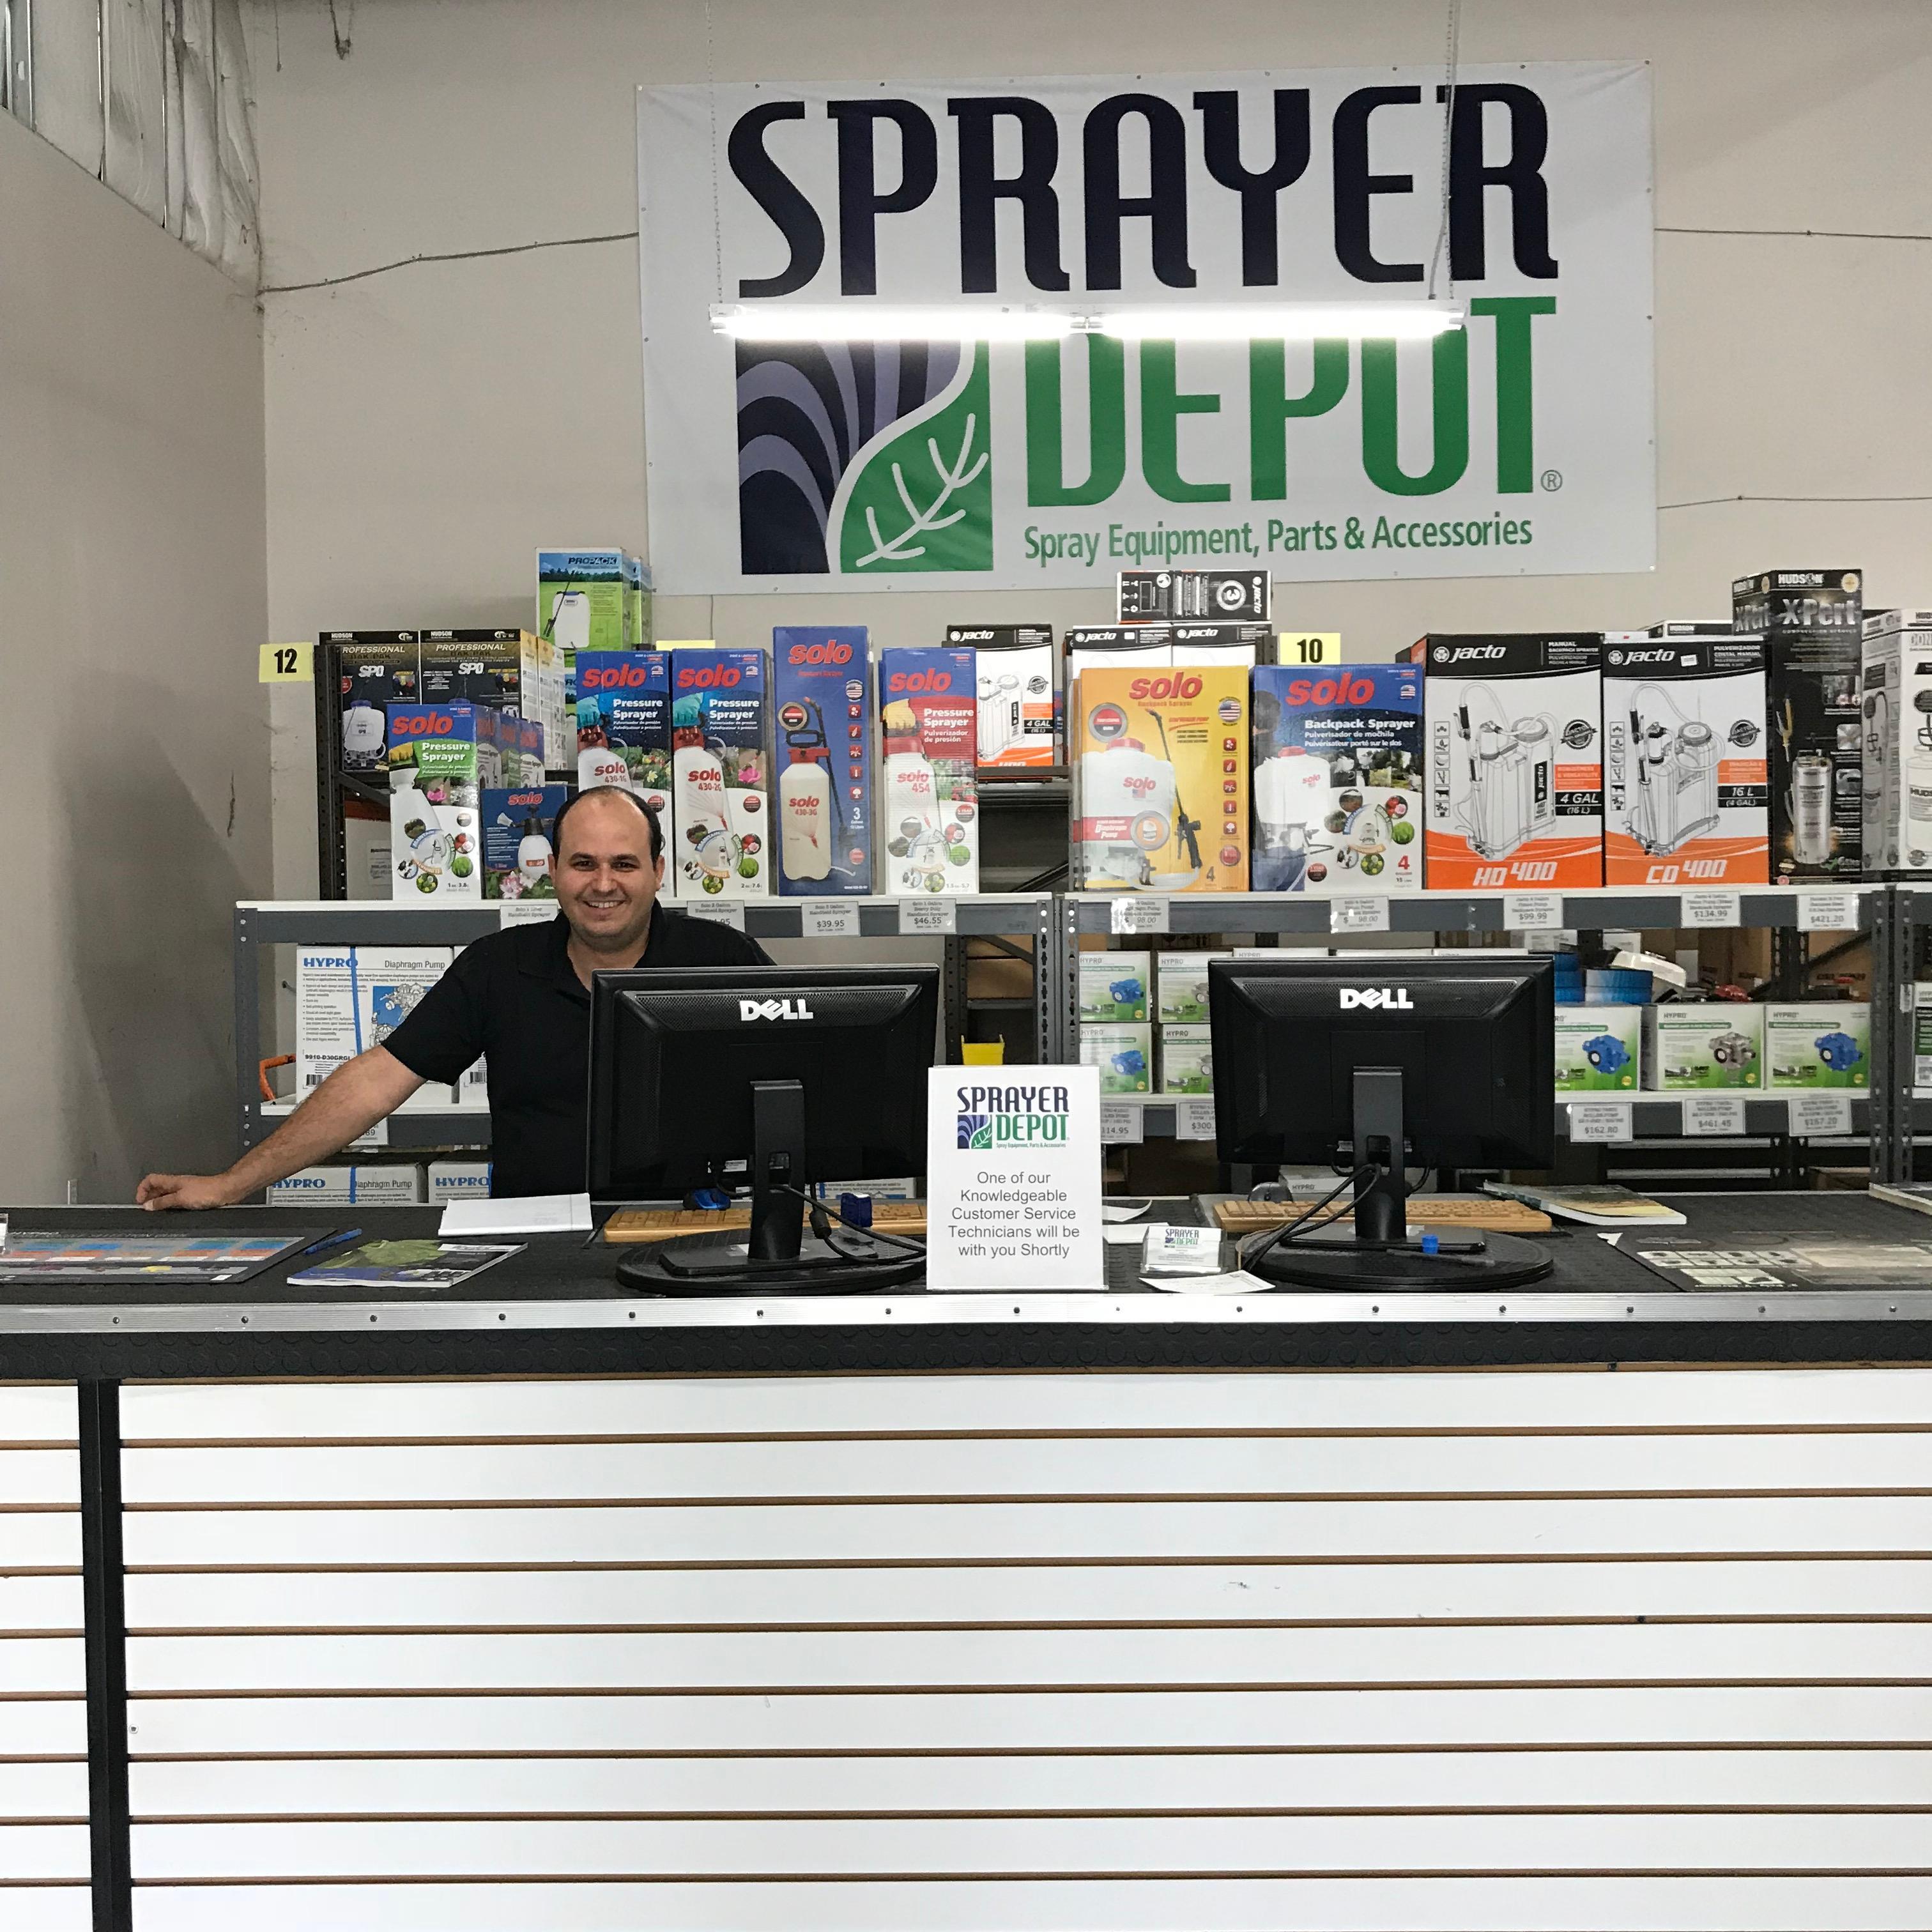 Sprayer Depot Orlando Showroom